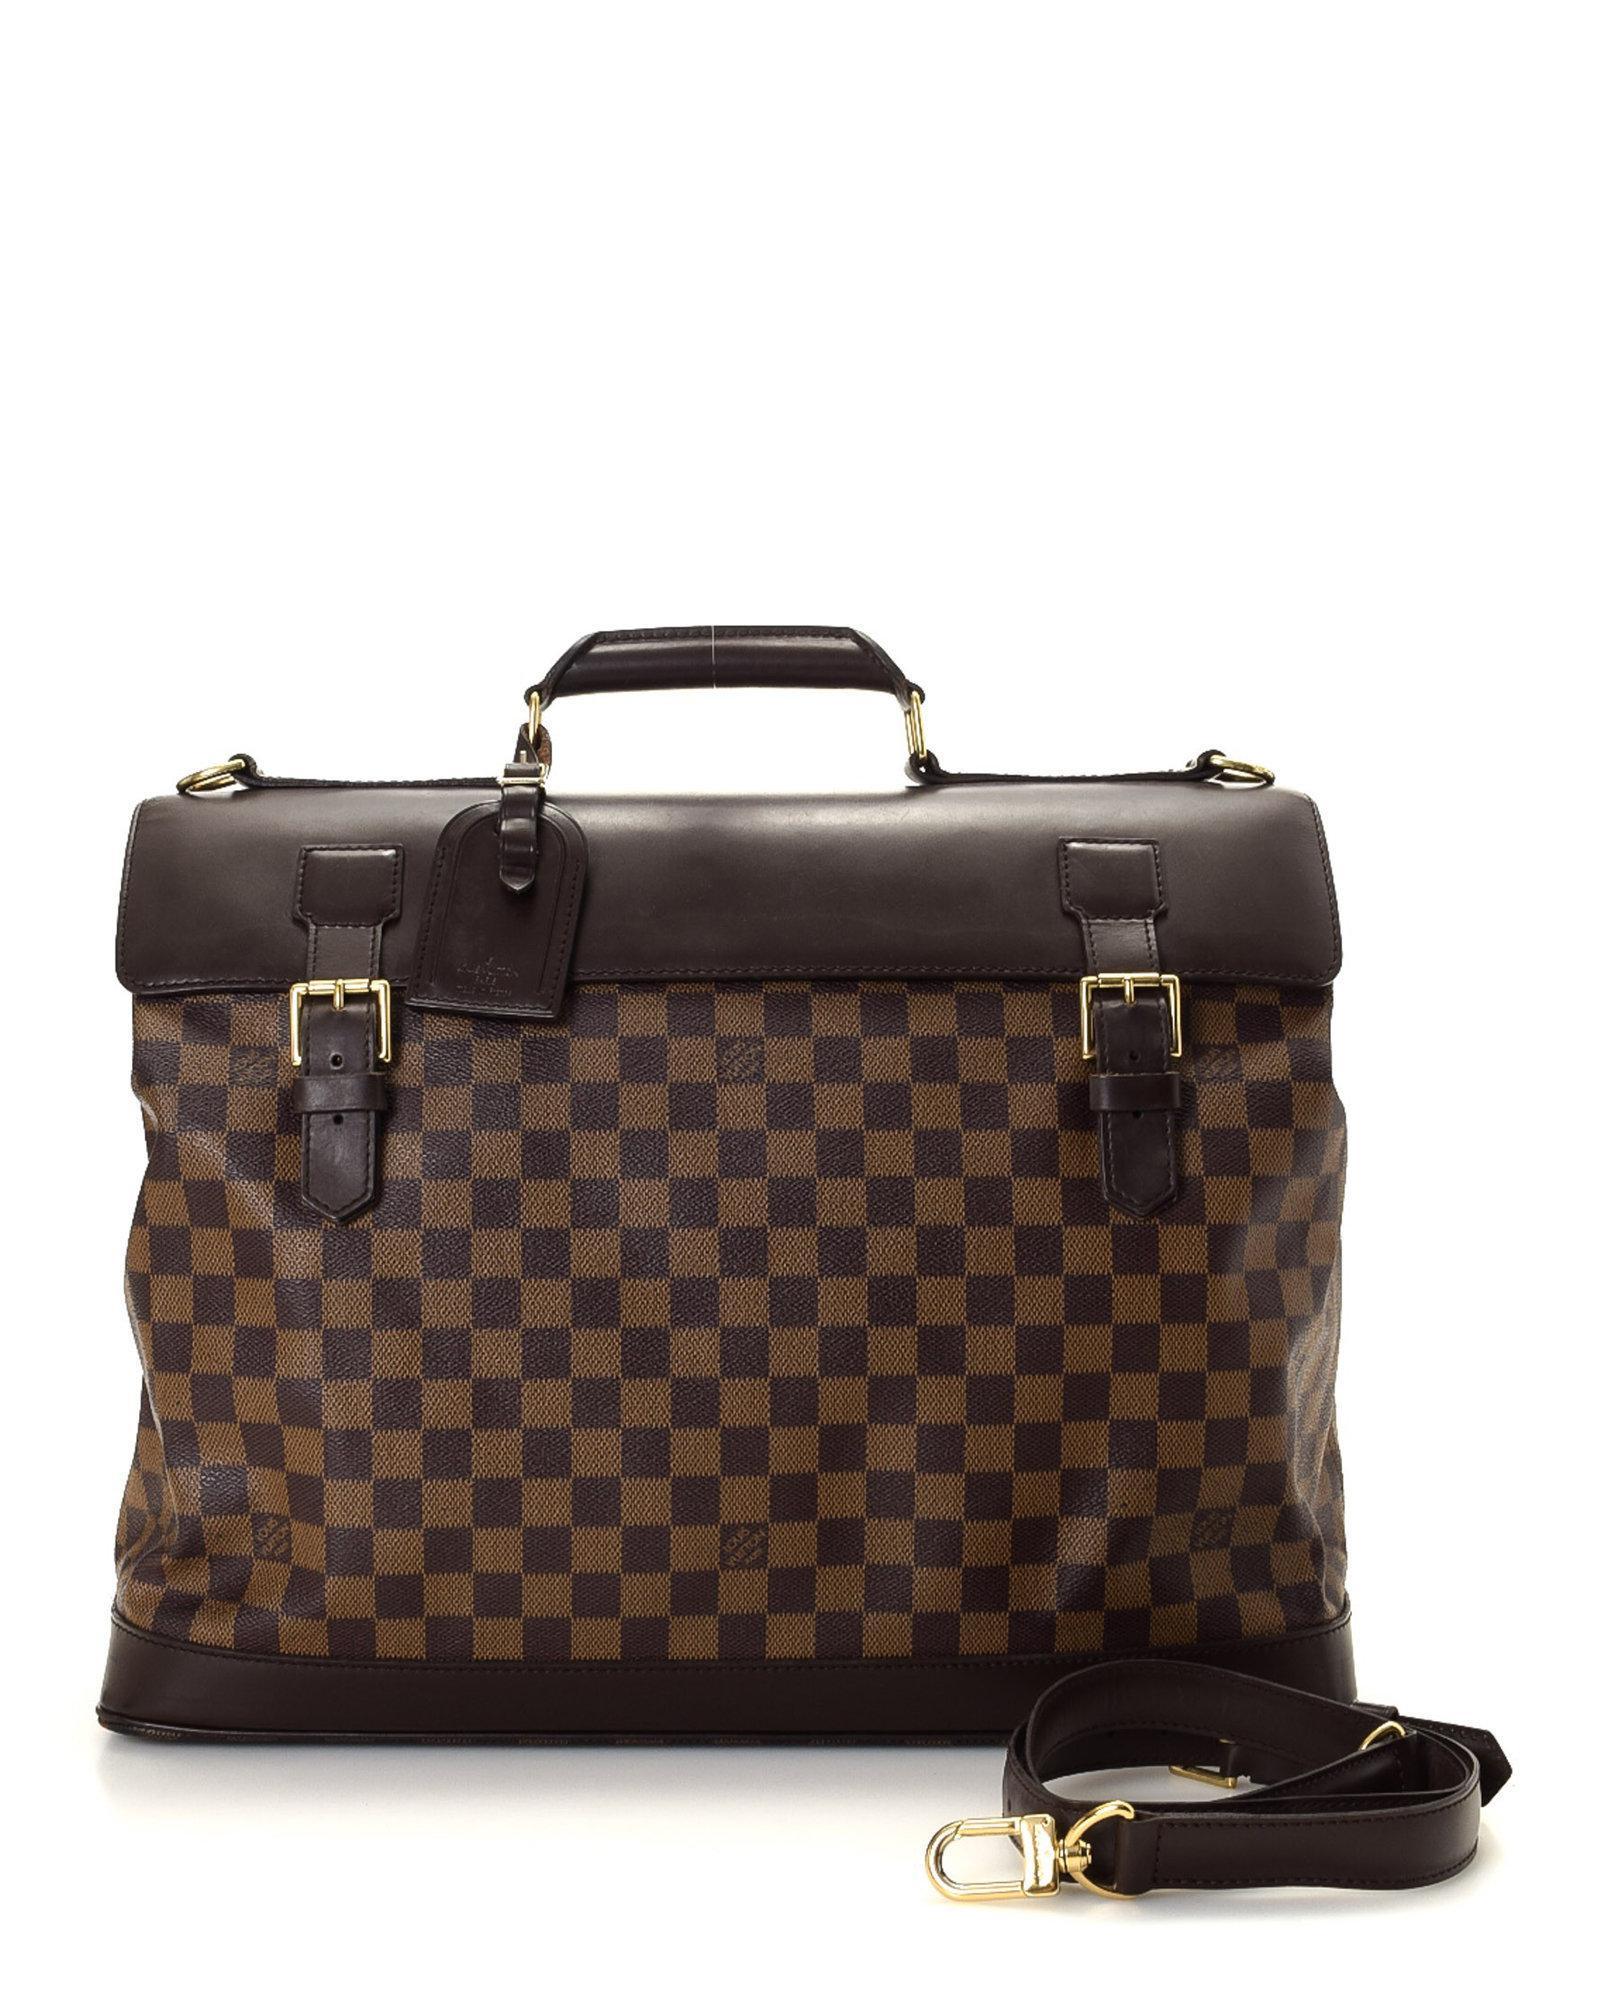 a393dd5e2d43 Lyst - Louis Vuitton West End Gm Travel Bag - Vintage in Brown